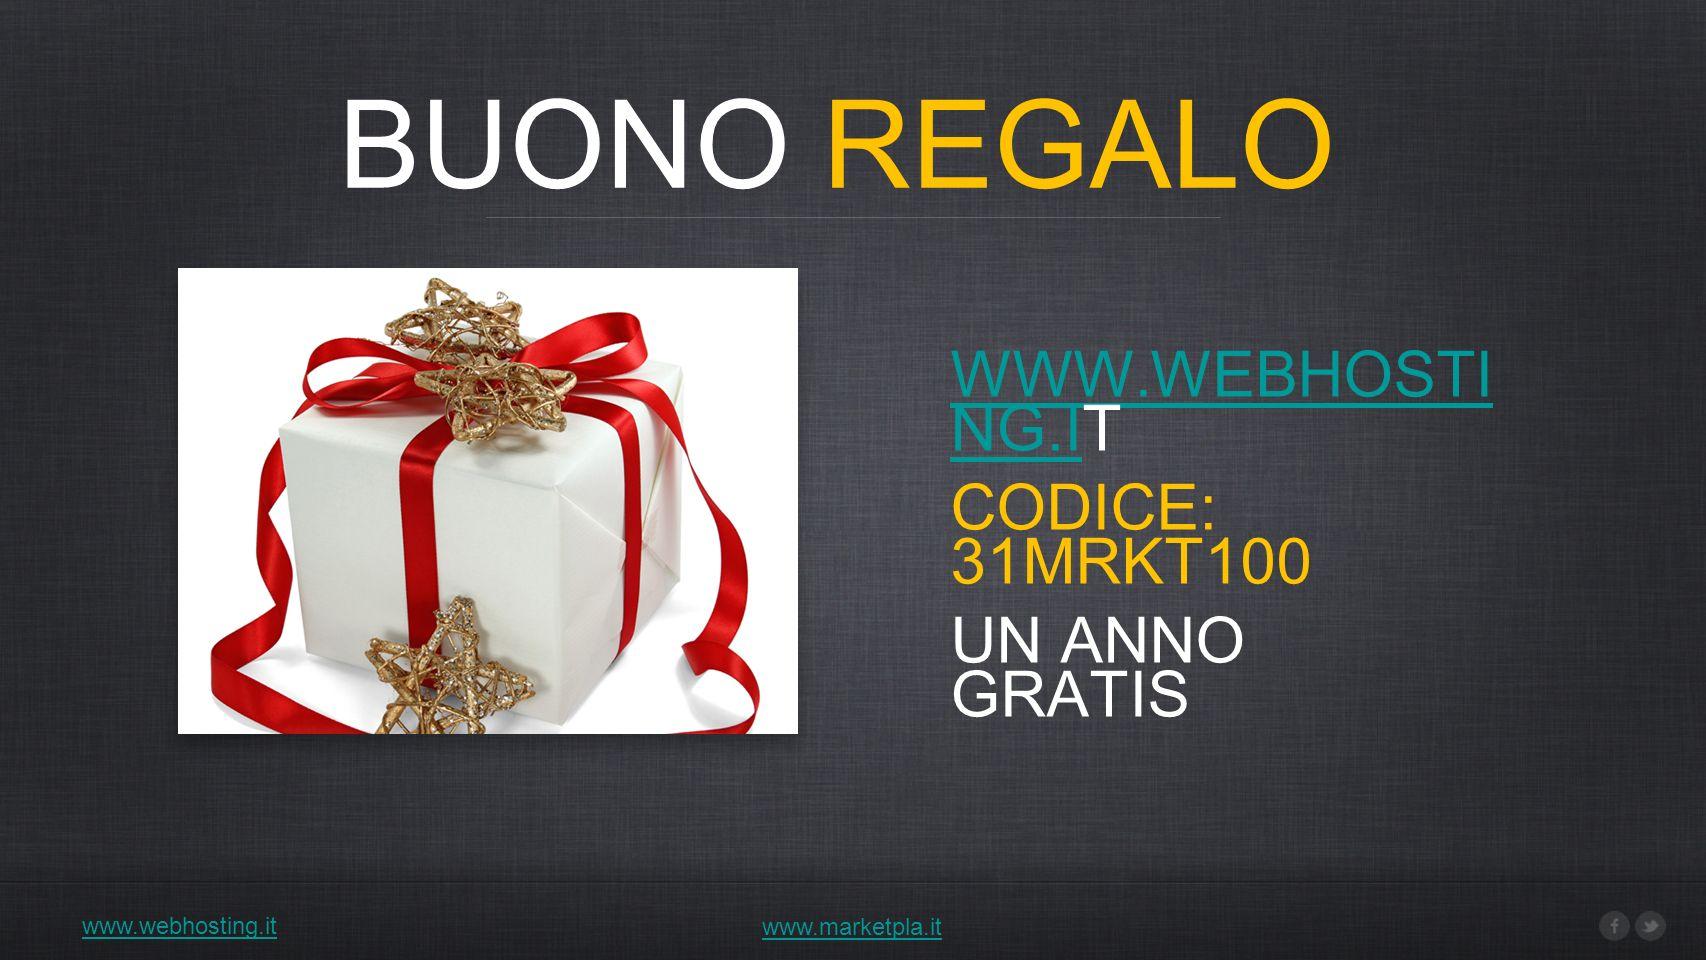 BUONO REGALO www.webhosting.it www.marketpla.it WWW.WEBHOSTI NG.IWWW.WEBHOSTI NG.IT CODICE: 31MRKT100 UN ANNO GRATIS